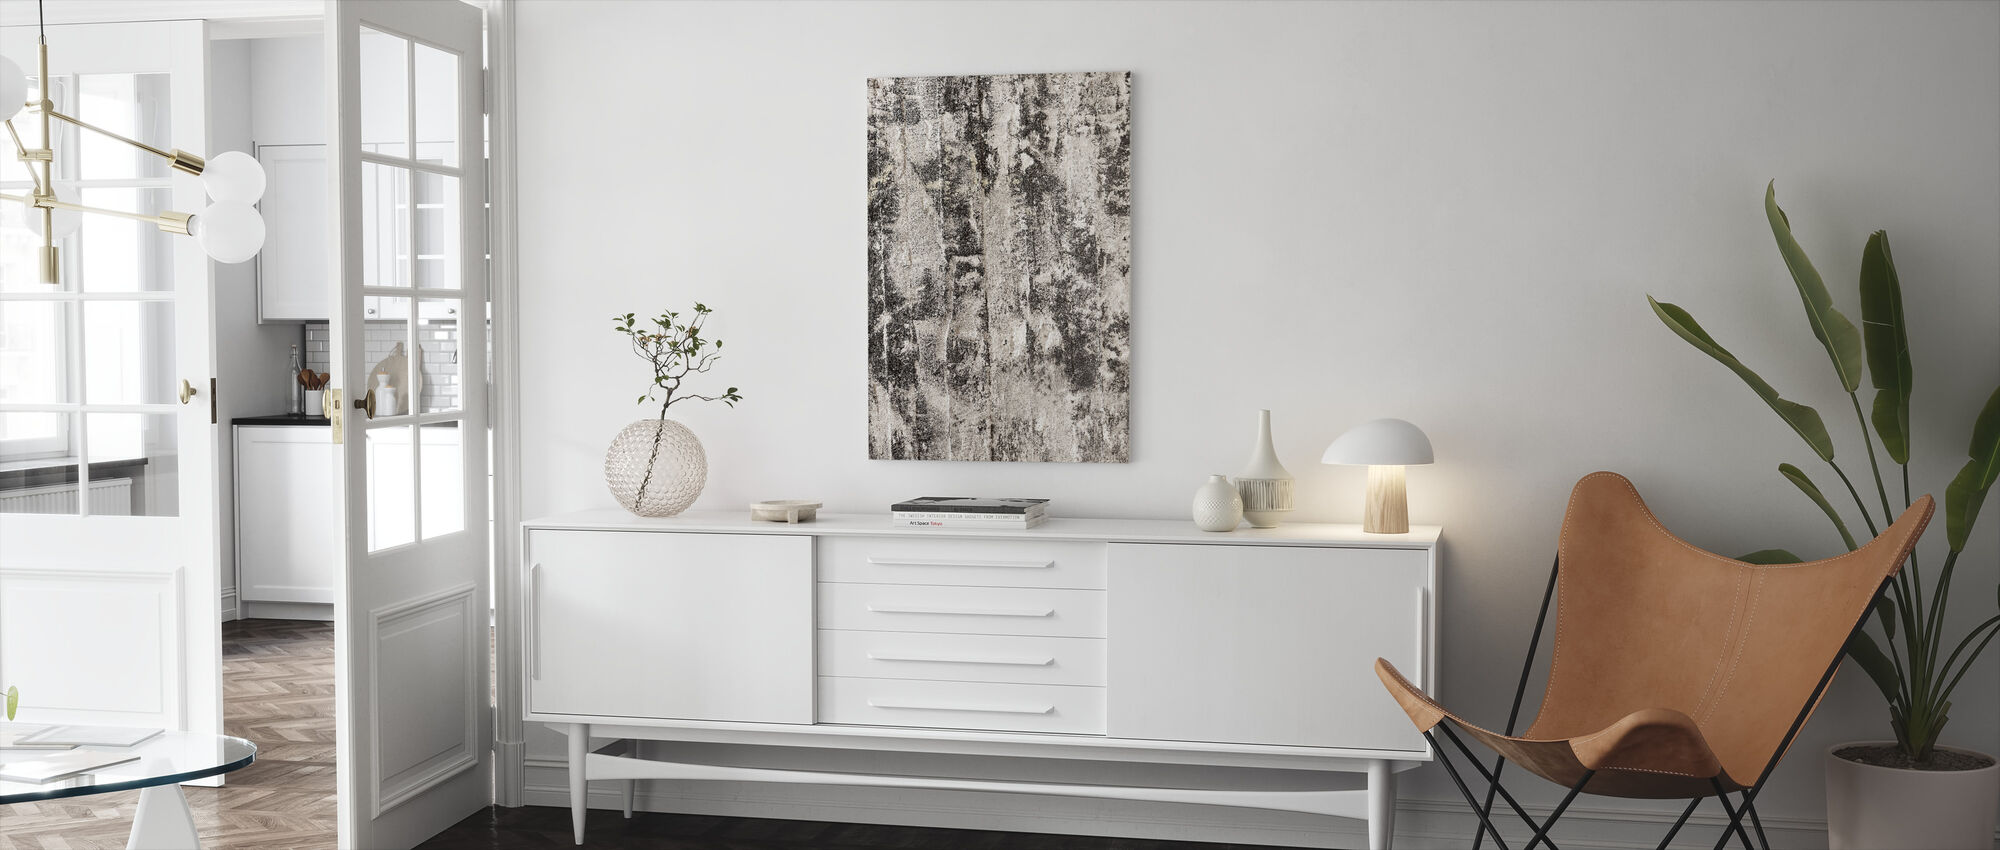 Rough Wall - Canvas print - Living Room